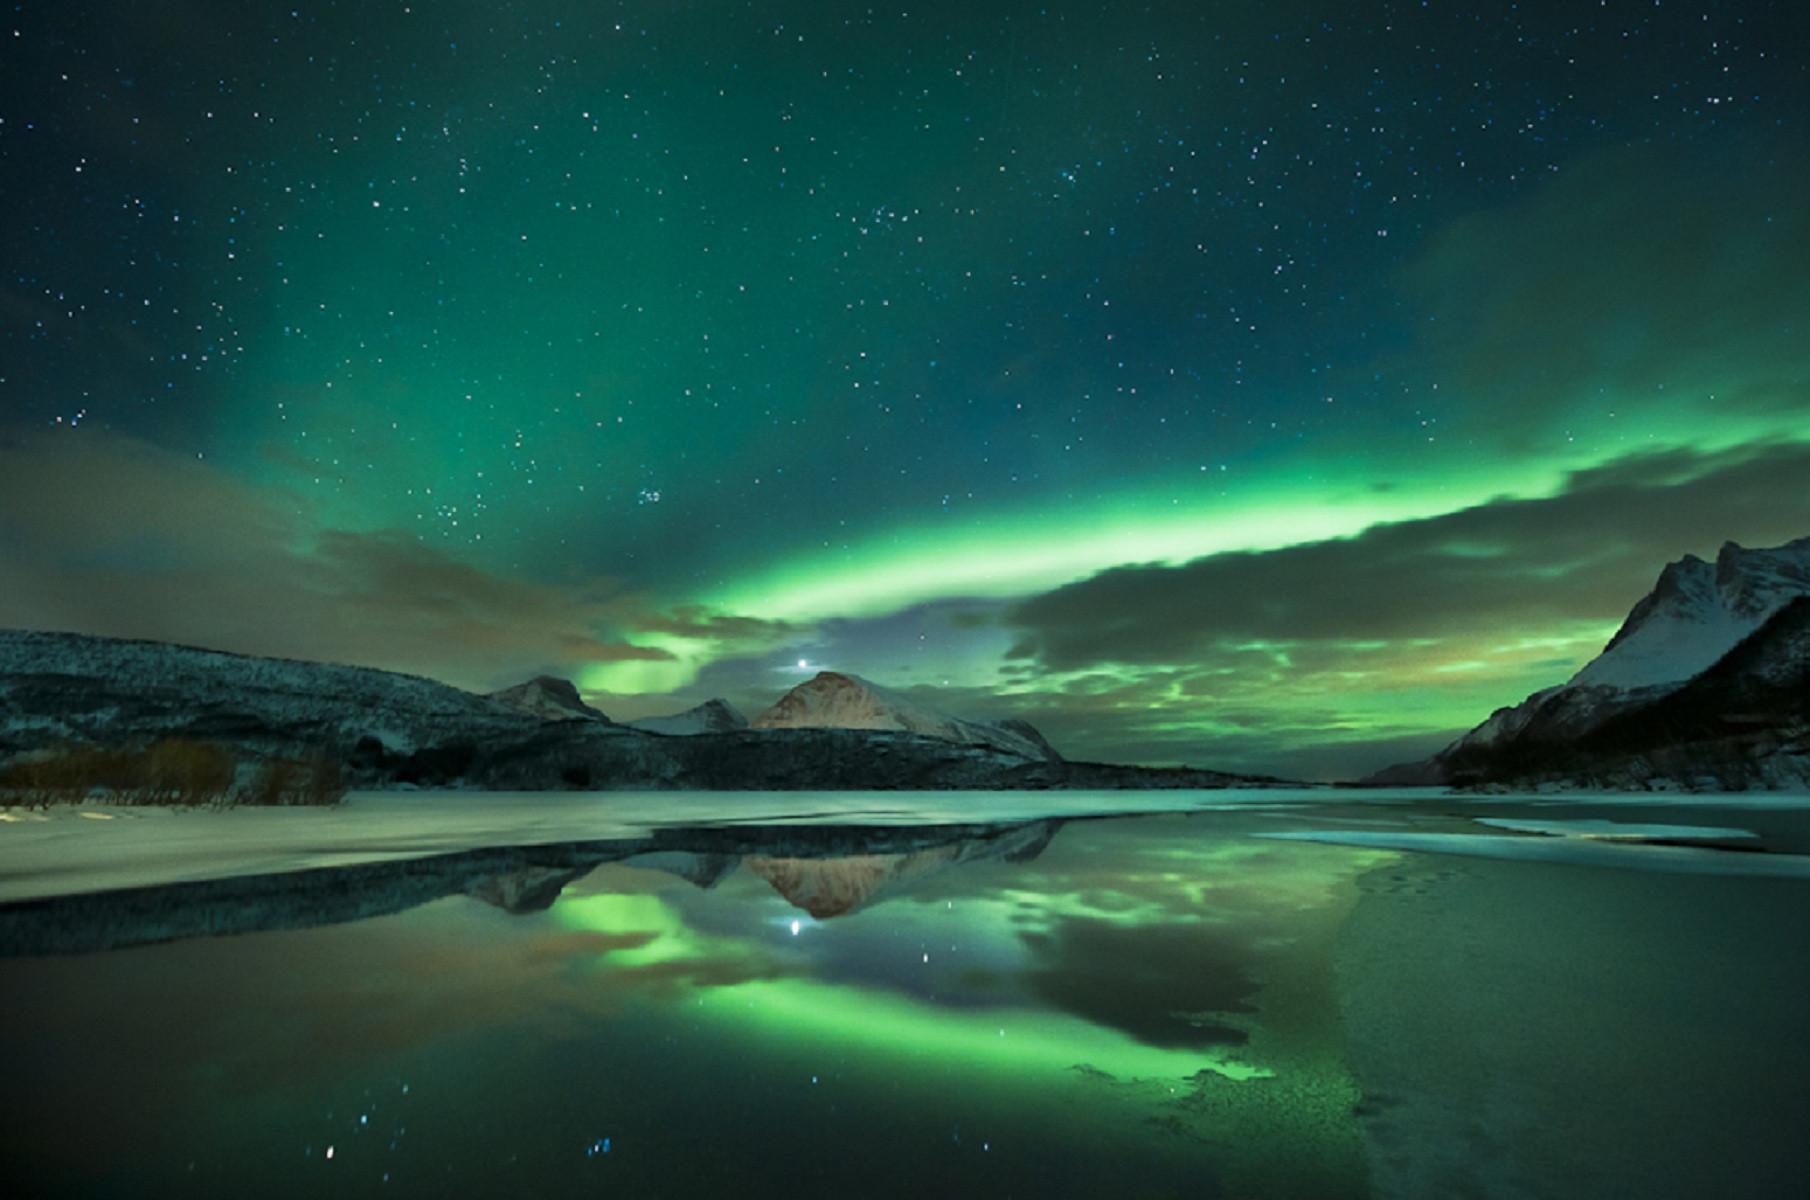 Northern Lights Wallpaper 1080p HD wallpaper background 1810x1200